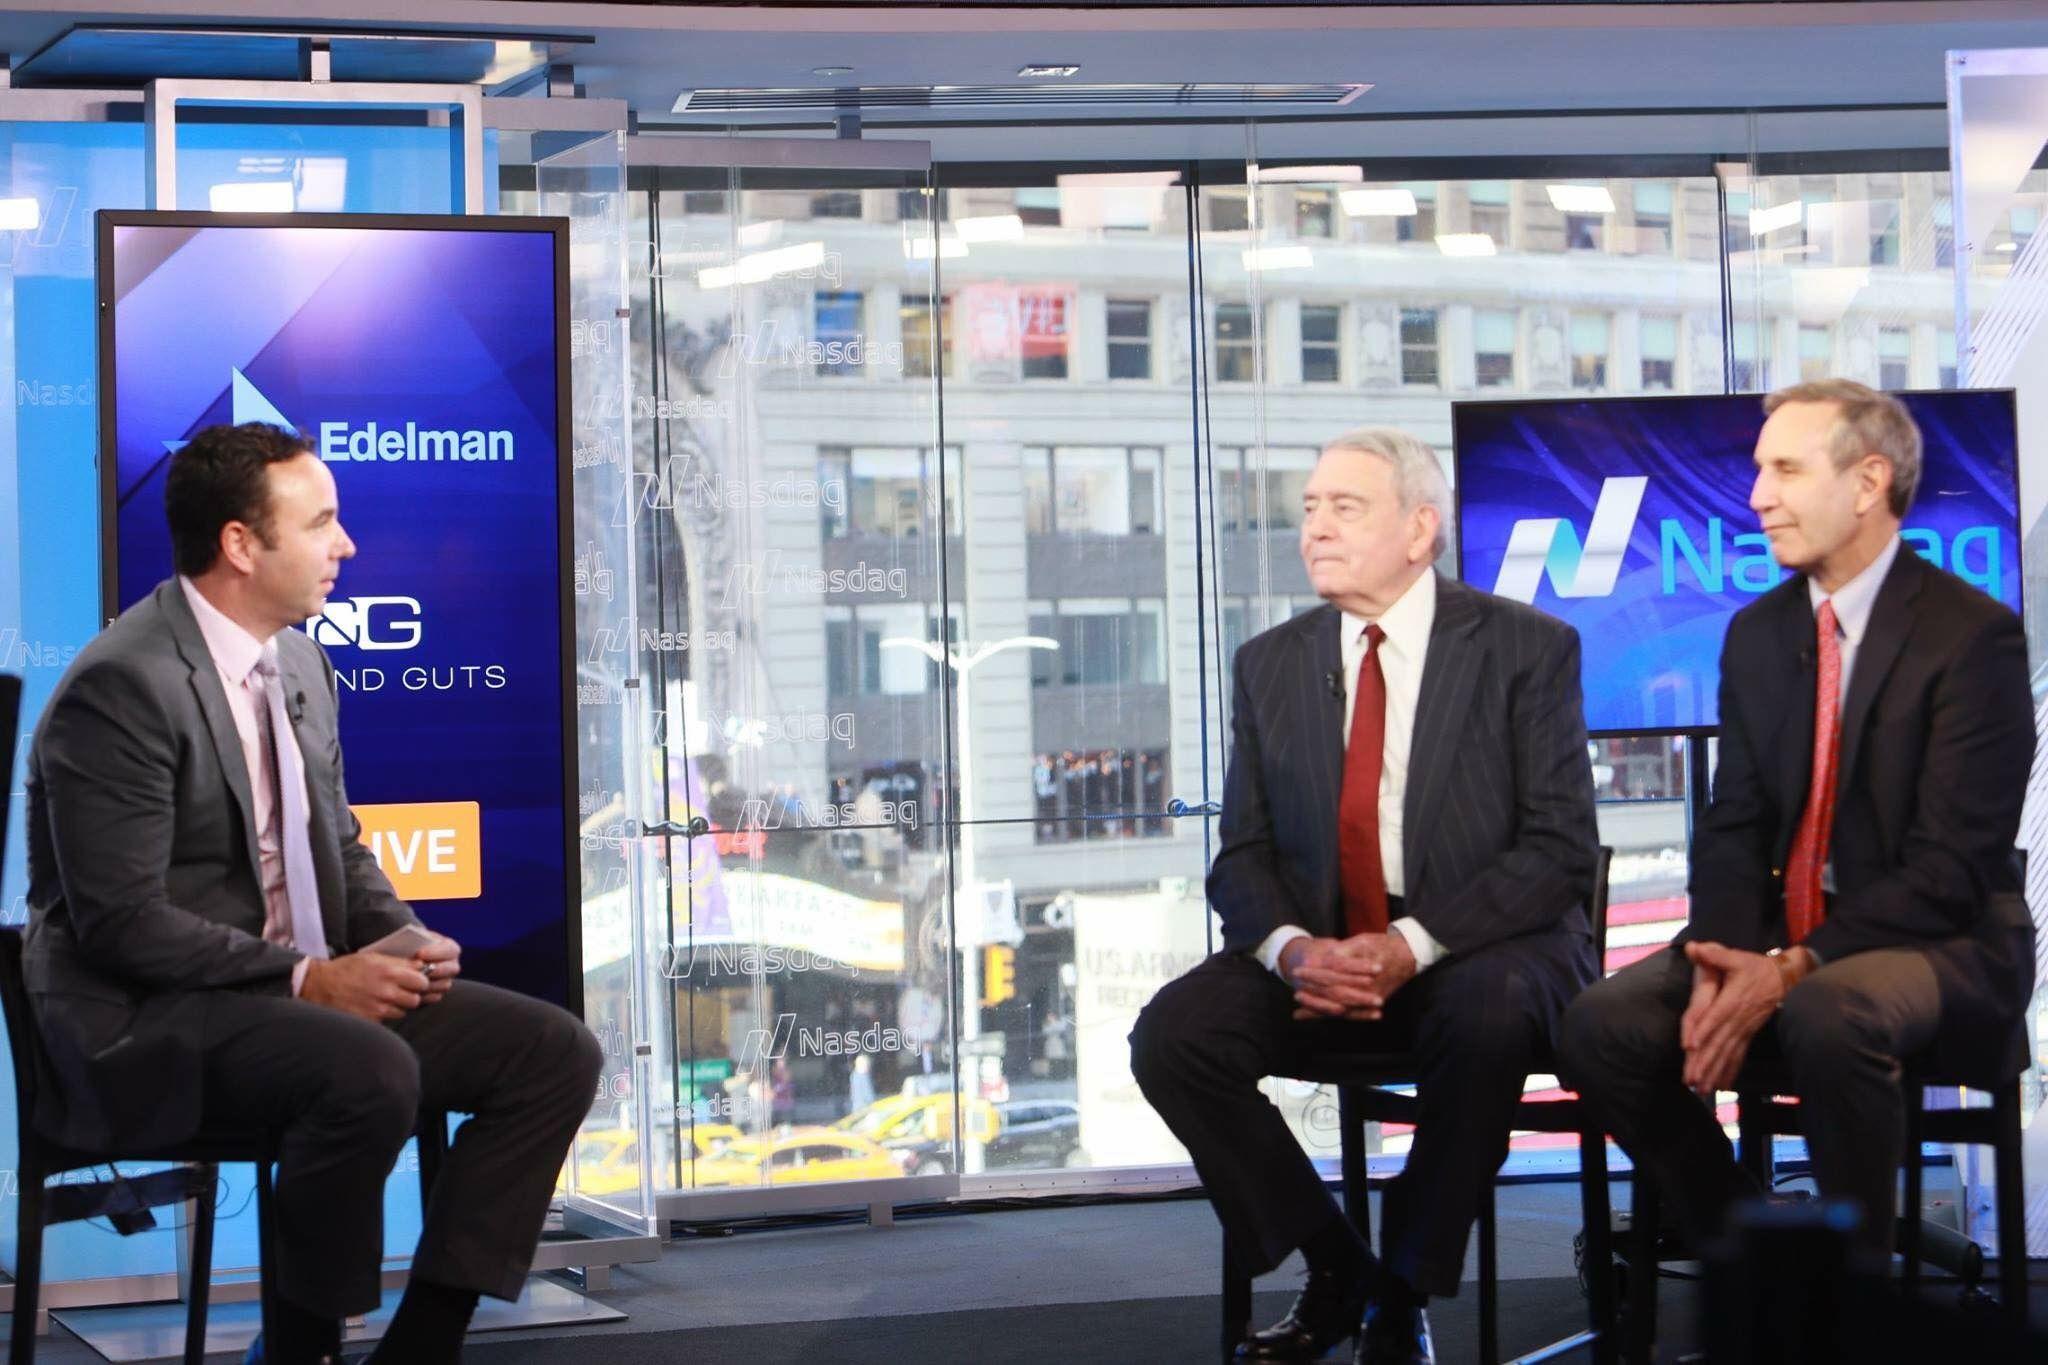 The legendary Dan Rather and Richard Edelman discussing trust at the Nasdaq MarketSite